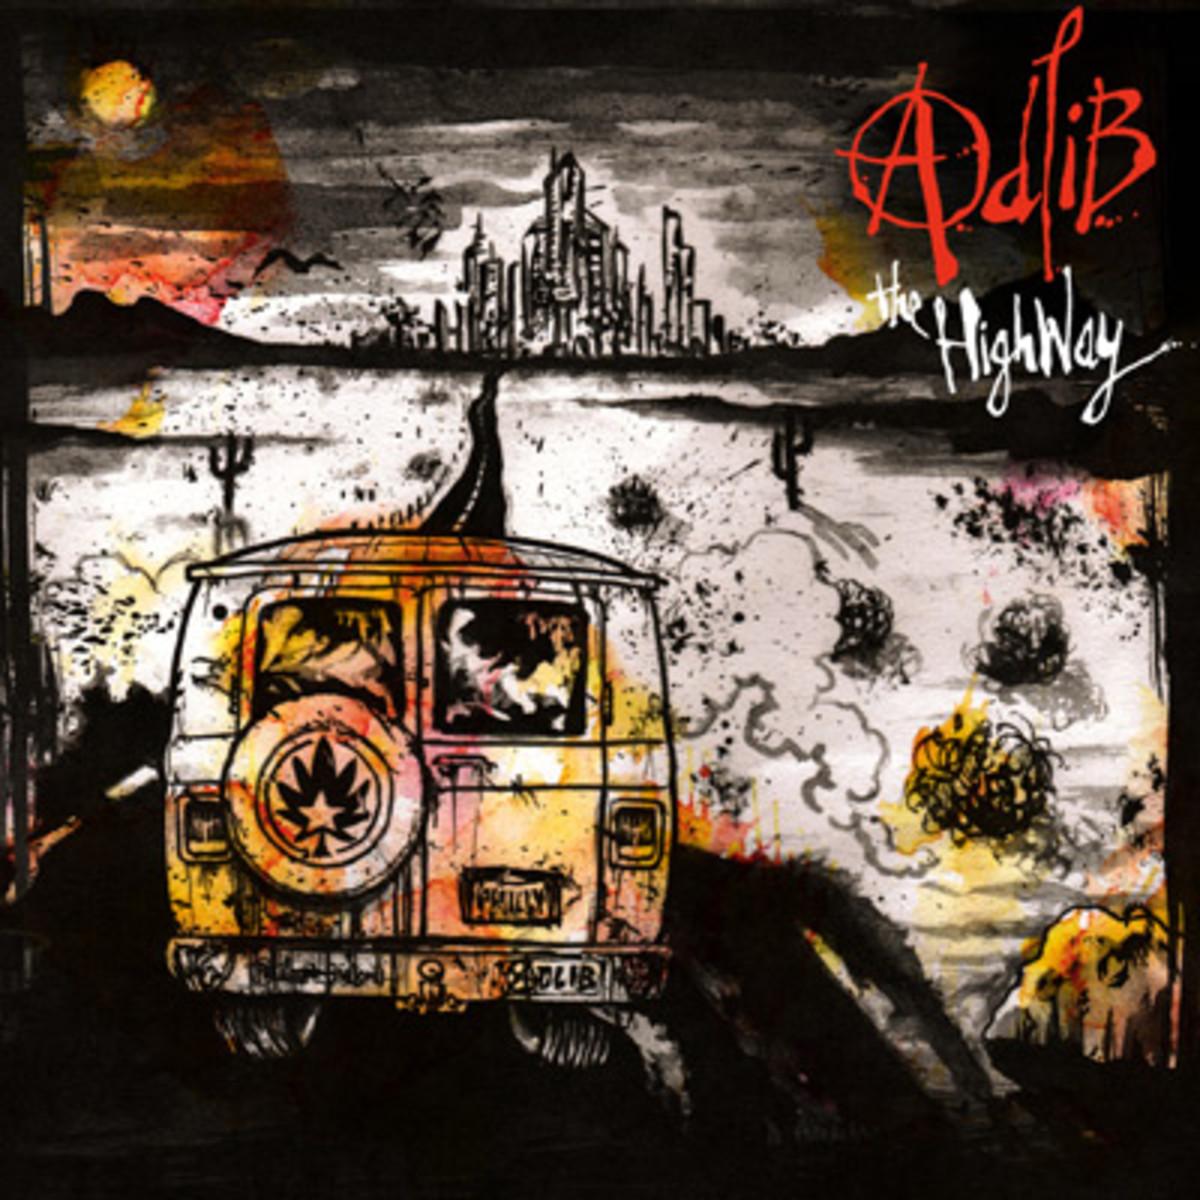 adlib-thehighway.jpg